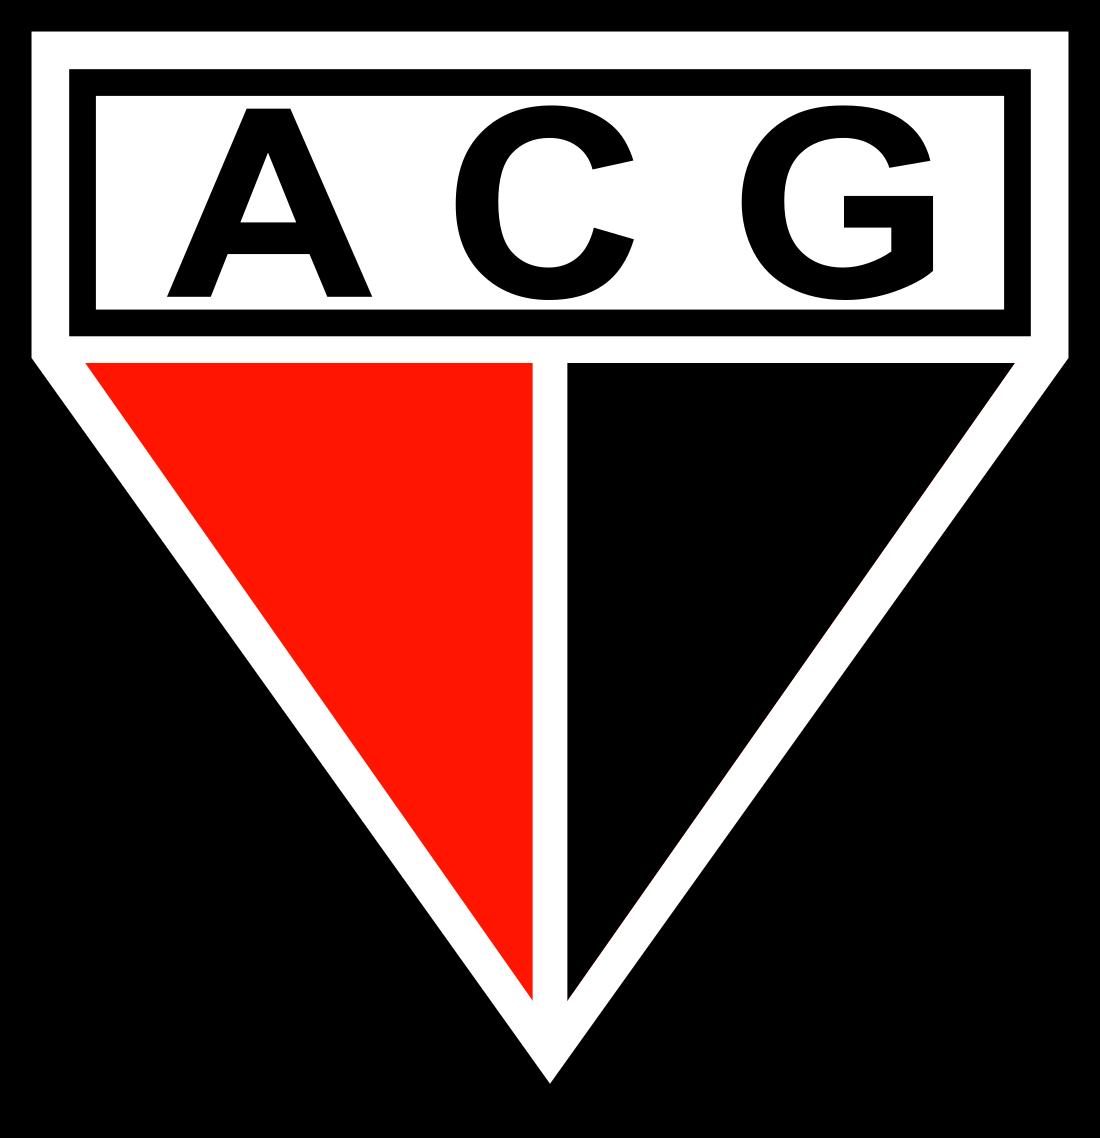 atletico go logo escudo 3 - Atlético Goianiense Logo